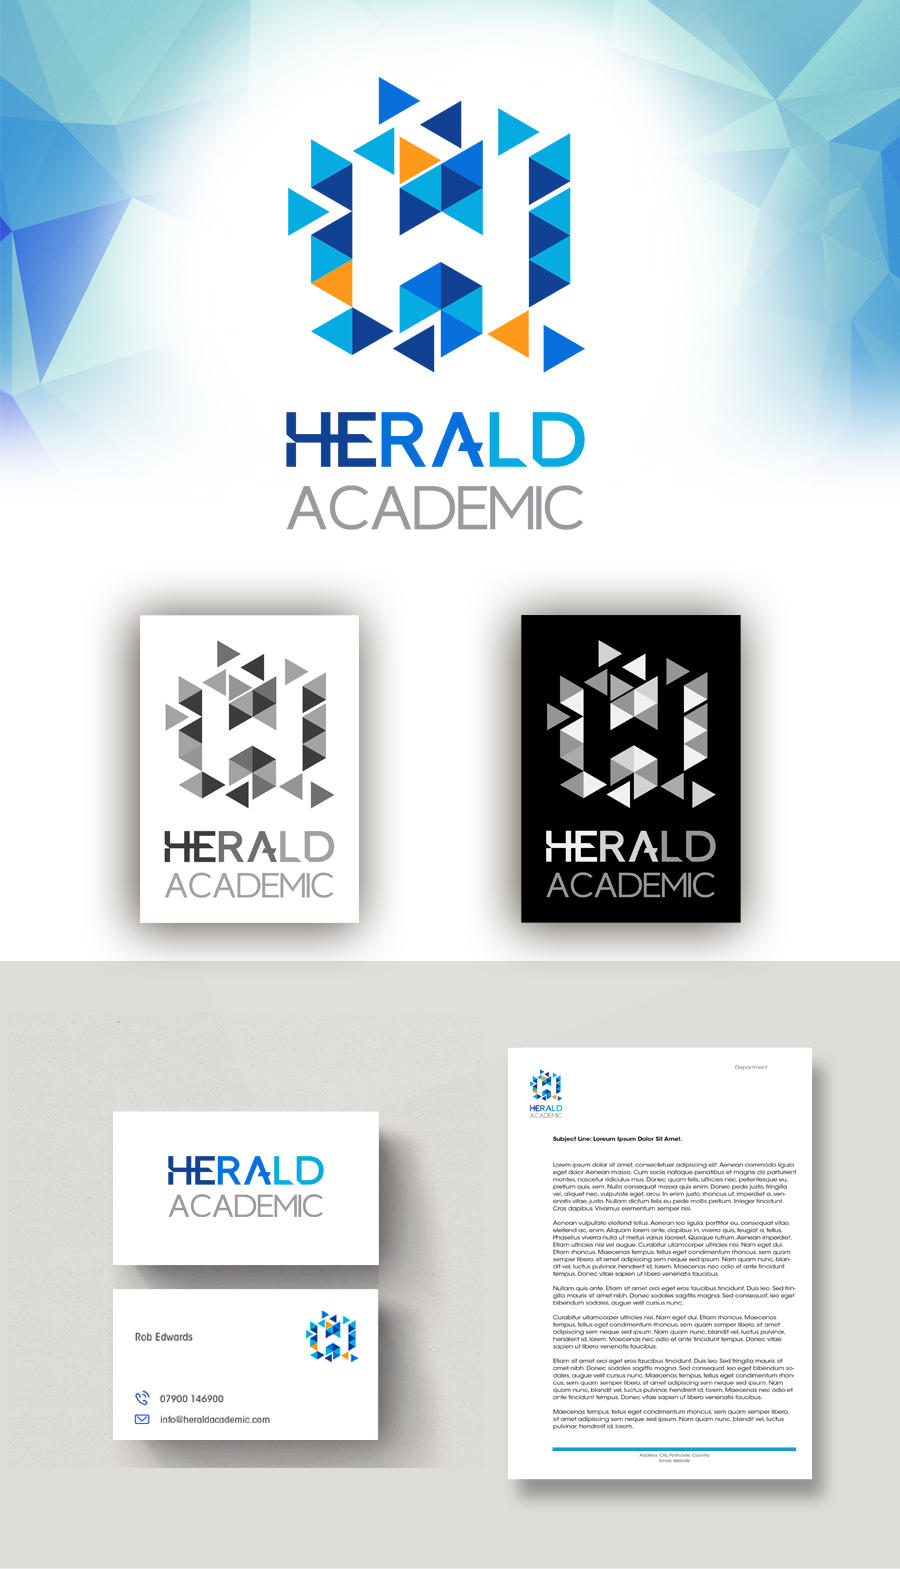 Herald Academic Logo